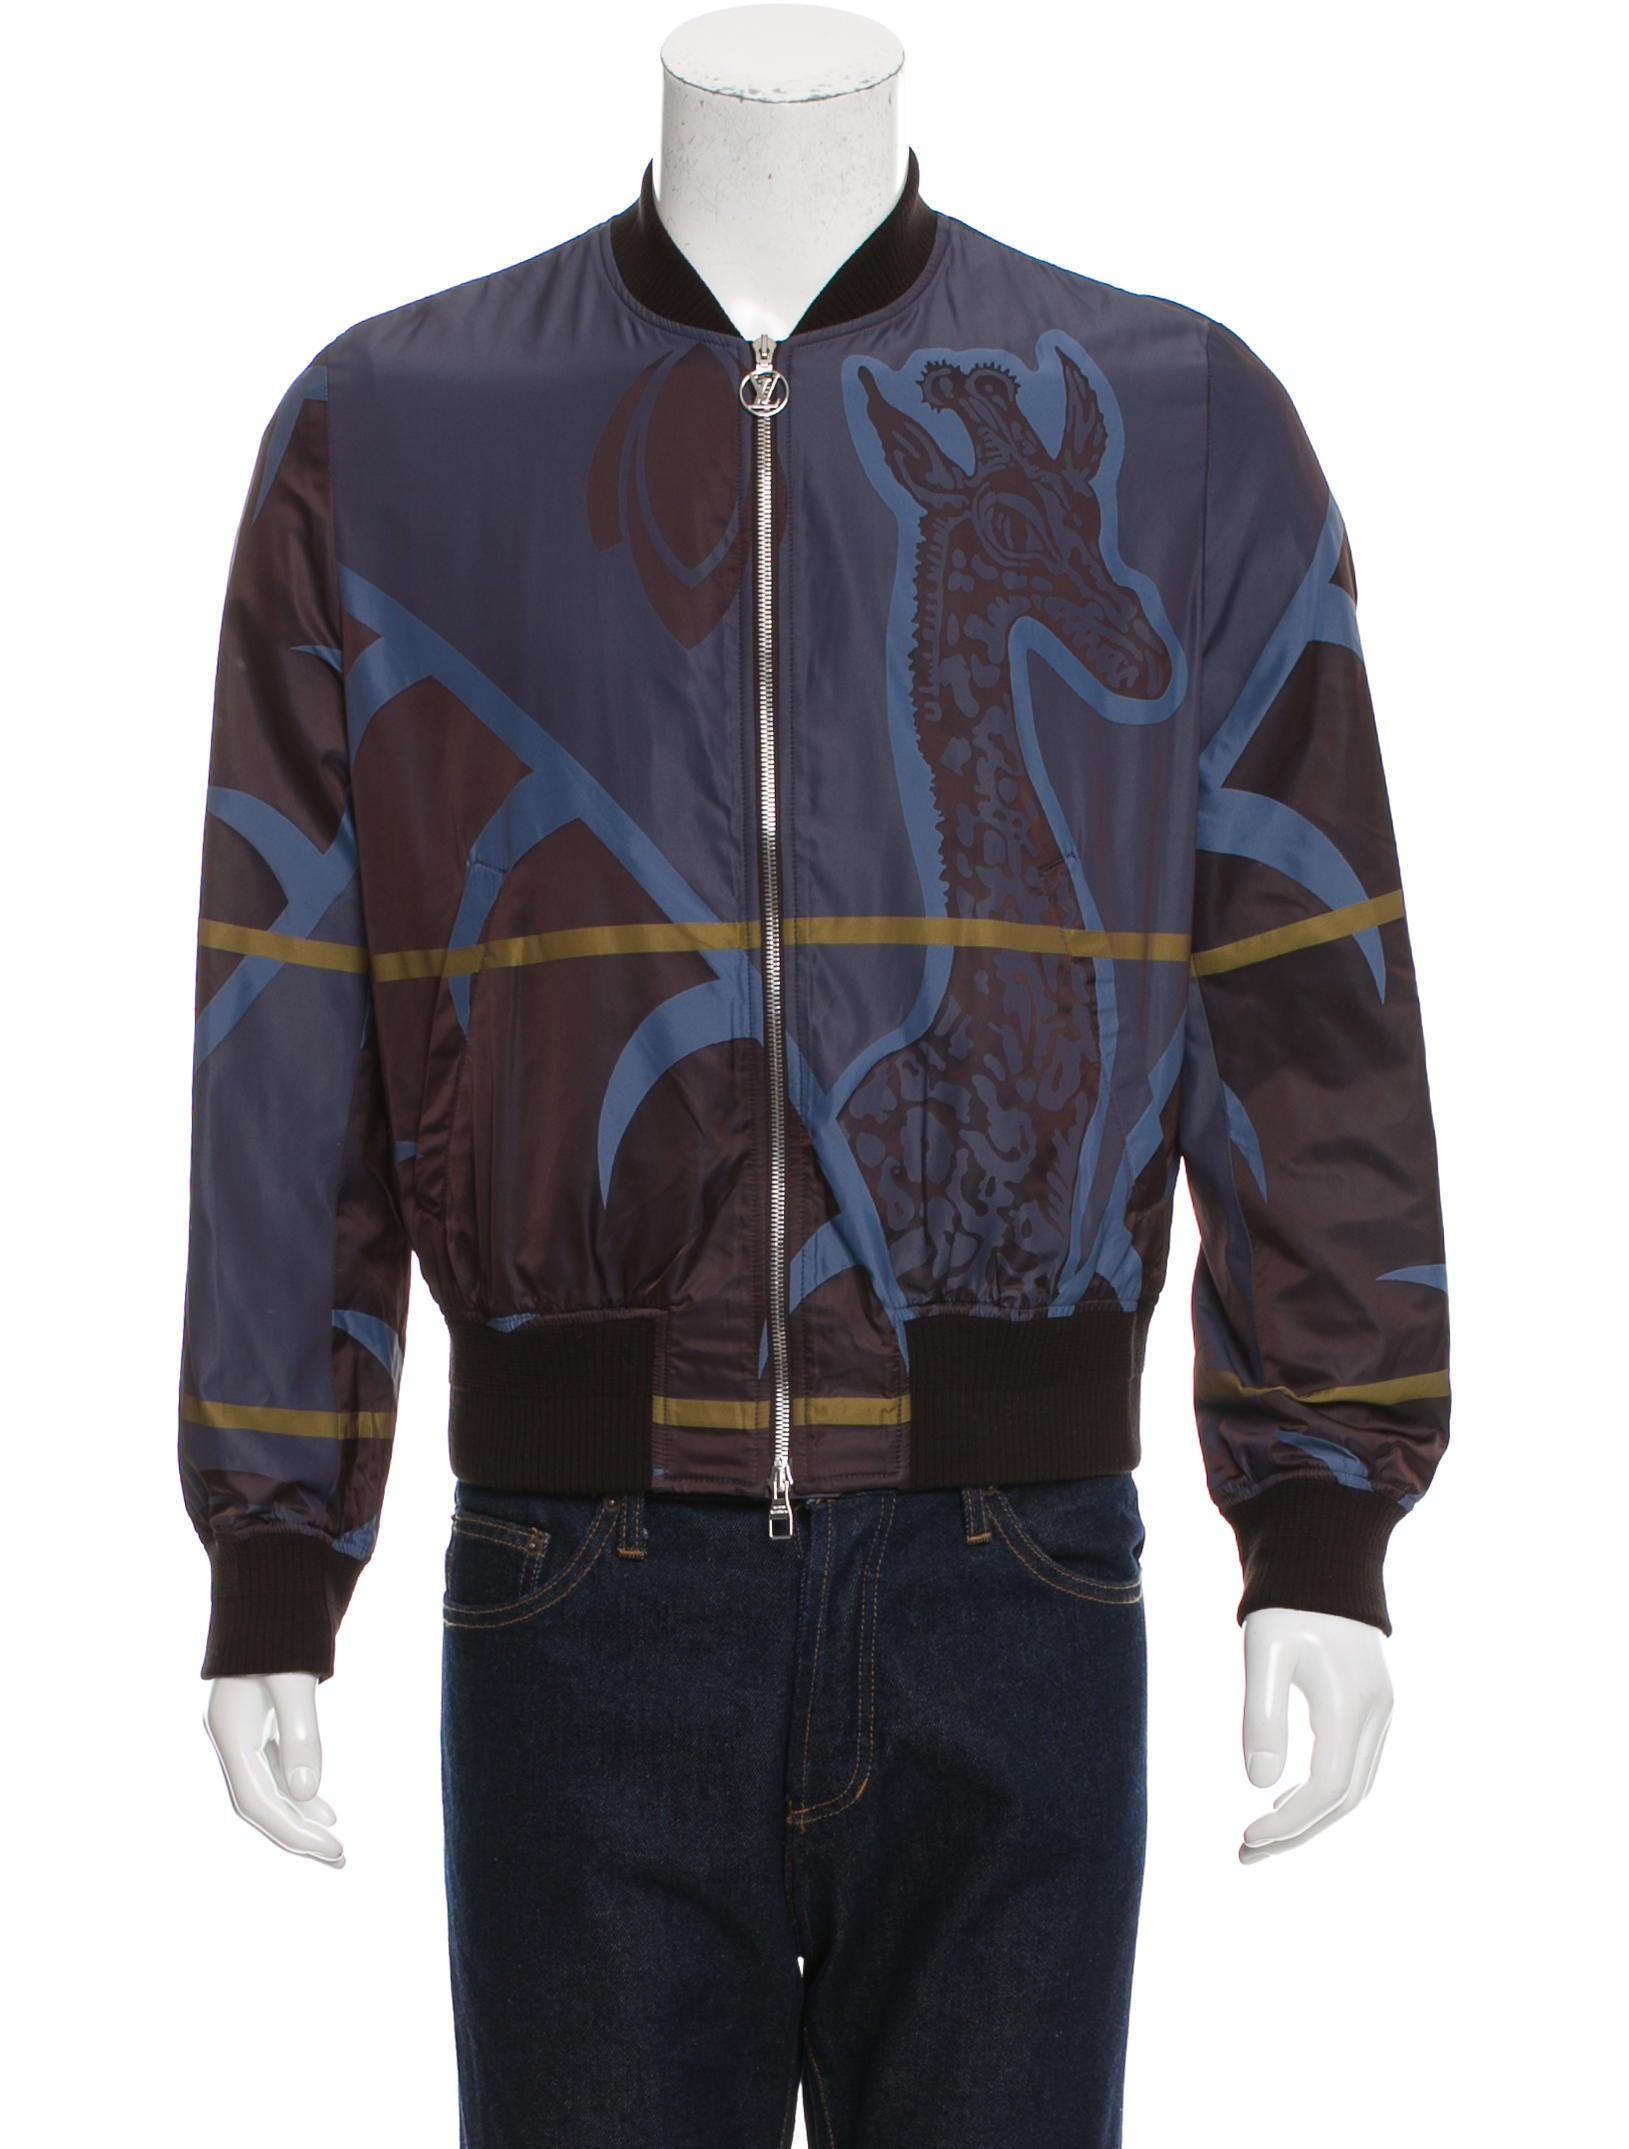 louis vuitton giraffe print bomber jacket clothing. Black Bedroom Furniture Sets. Home Design Ideas